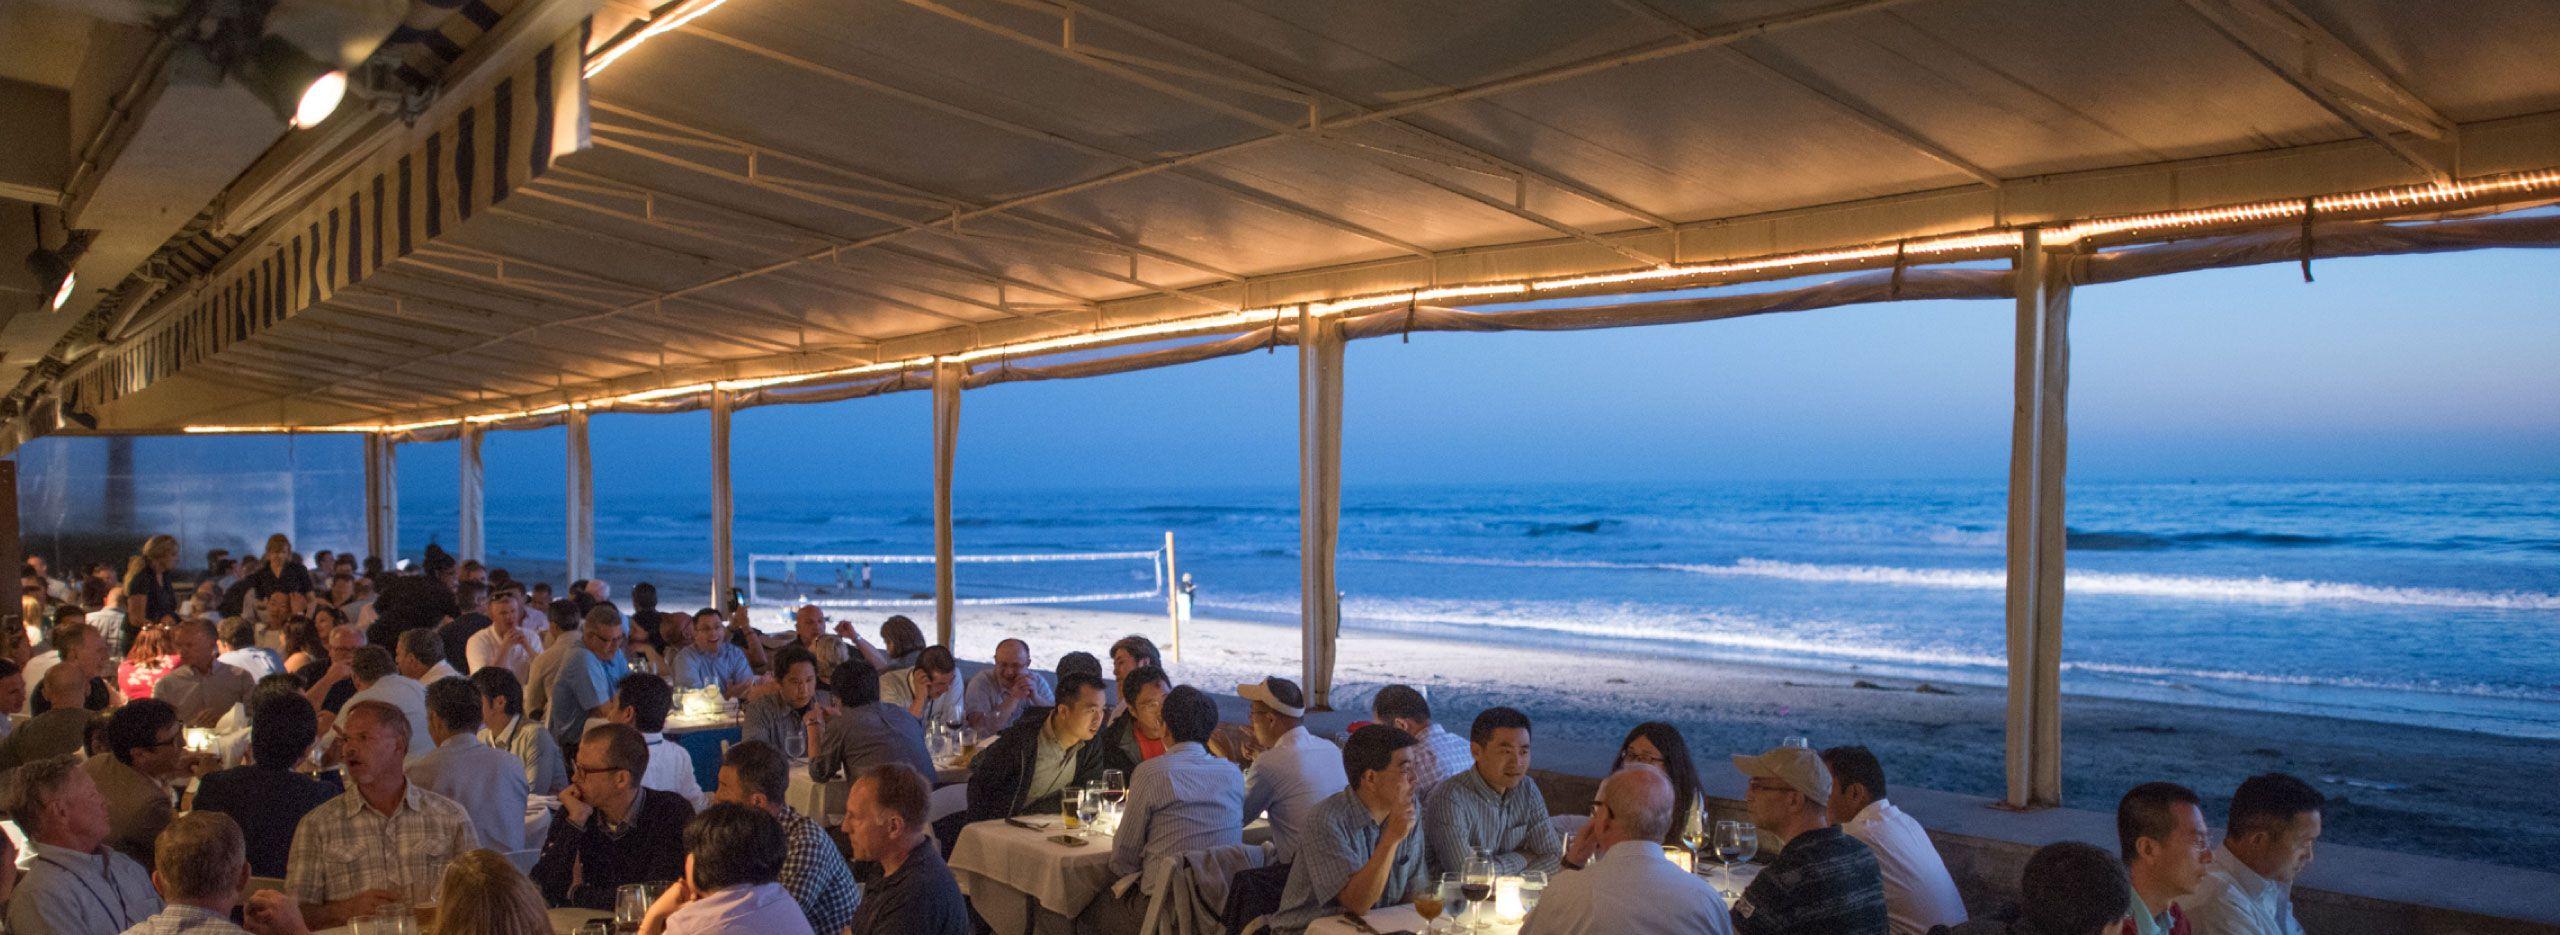 Poseidon Restaurant Del Mar